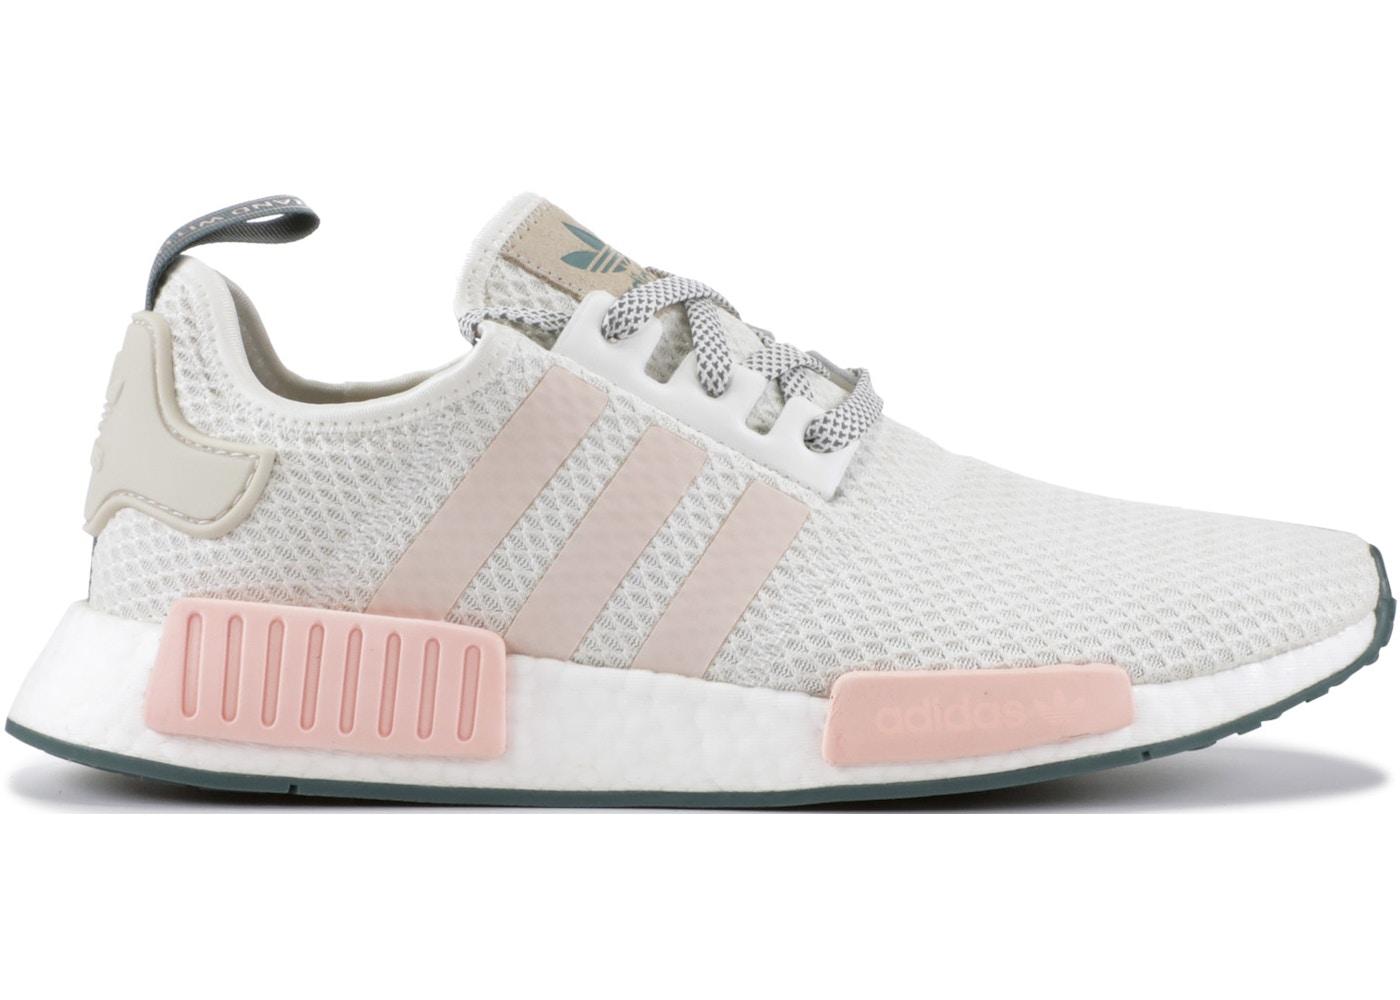 adidas NMD R1 Running White Icey Pink (W)